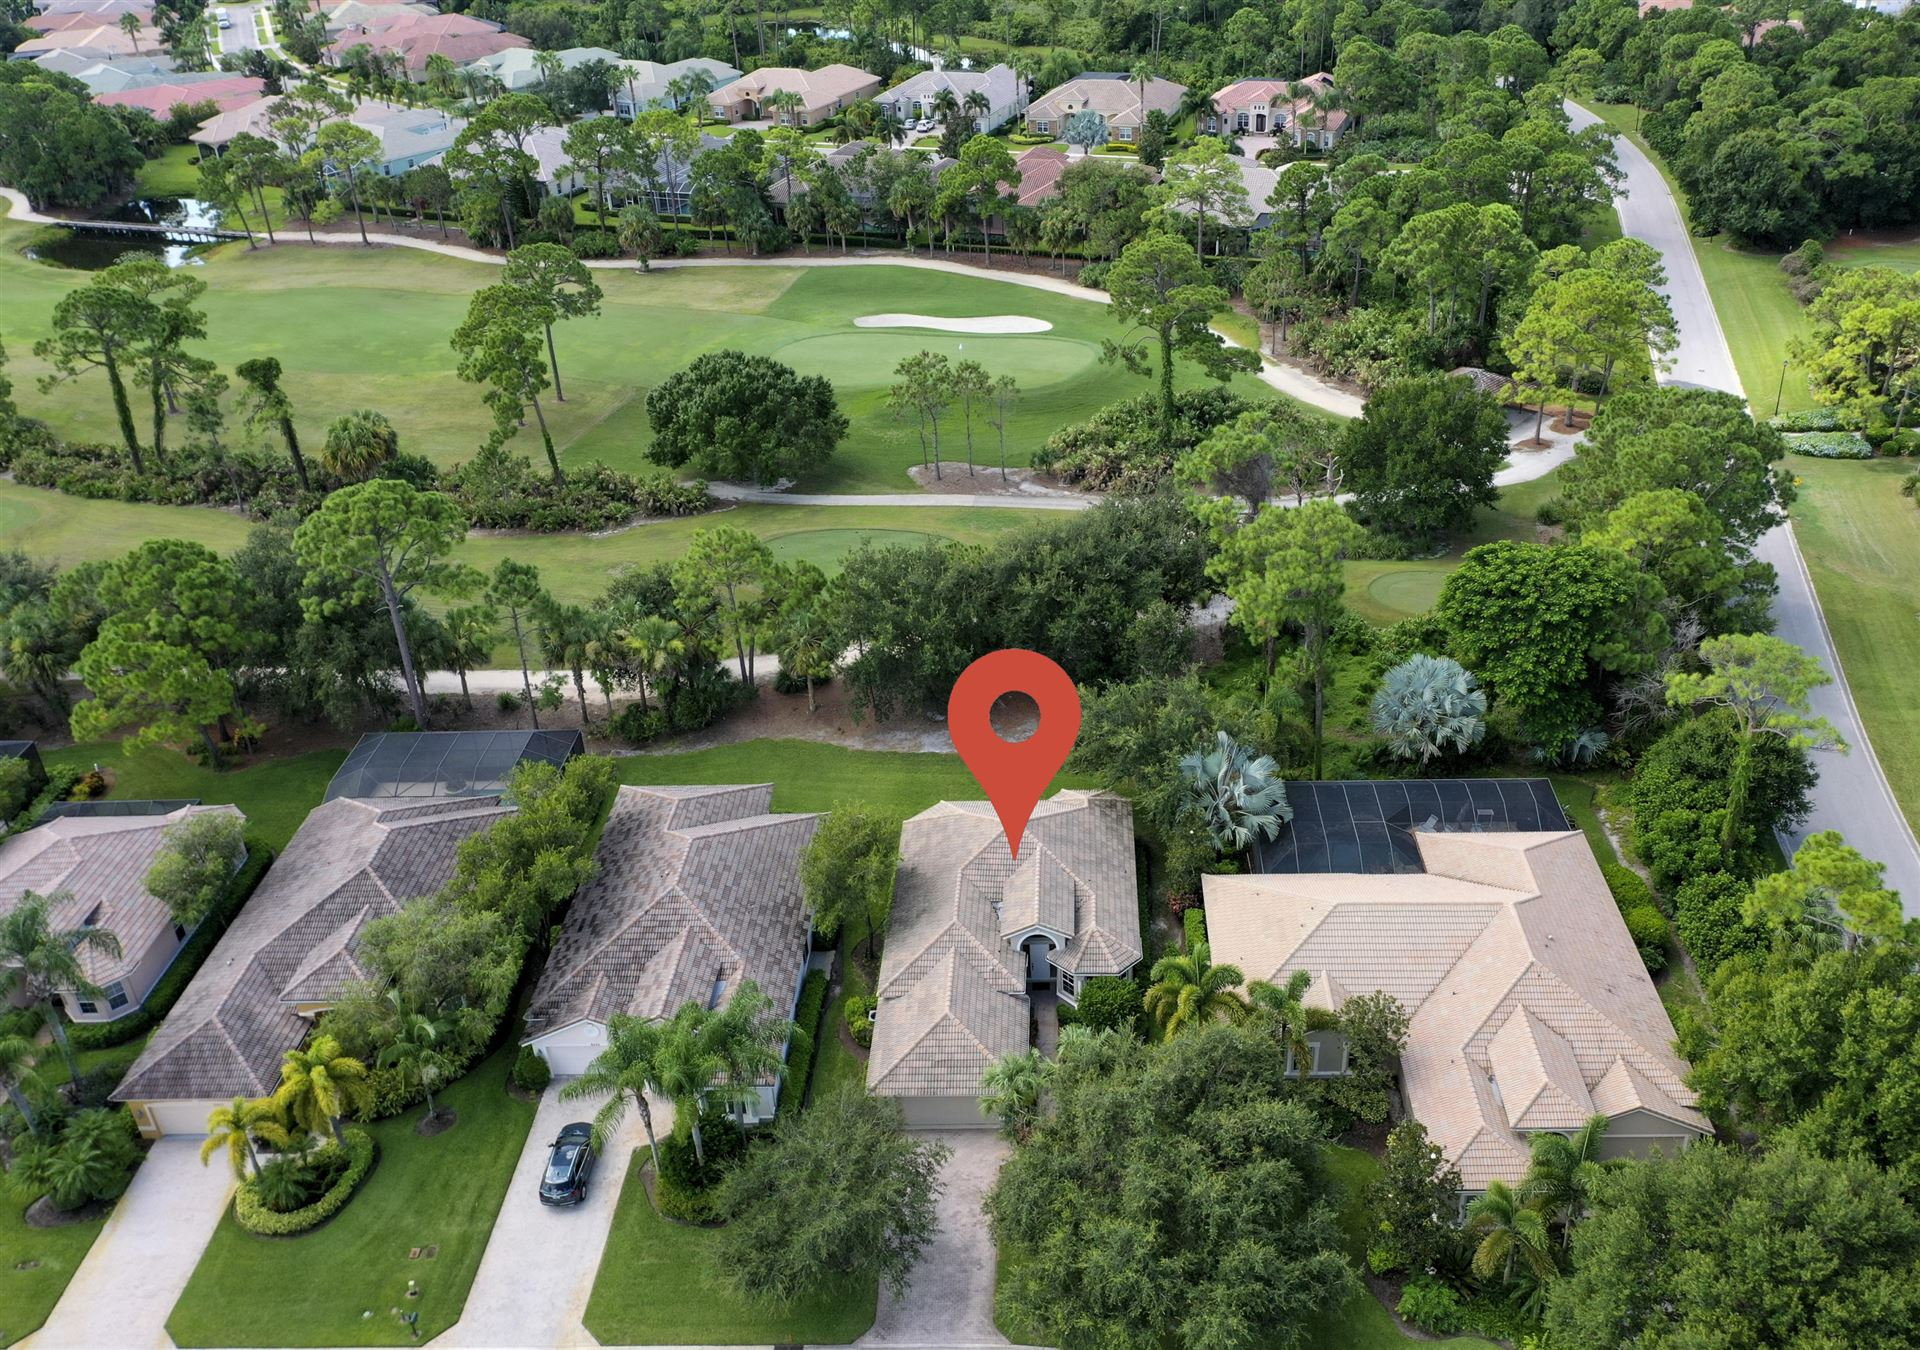 Photo of 9535 Avenel Lane, Port Saint Lucie, FL 34986 (MLS # RX-10650925)